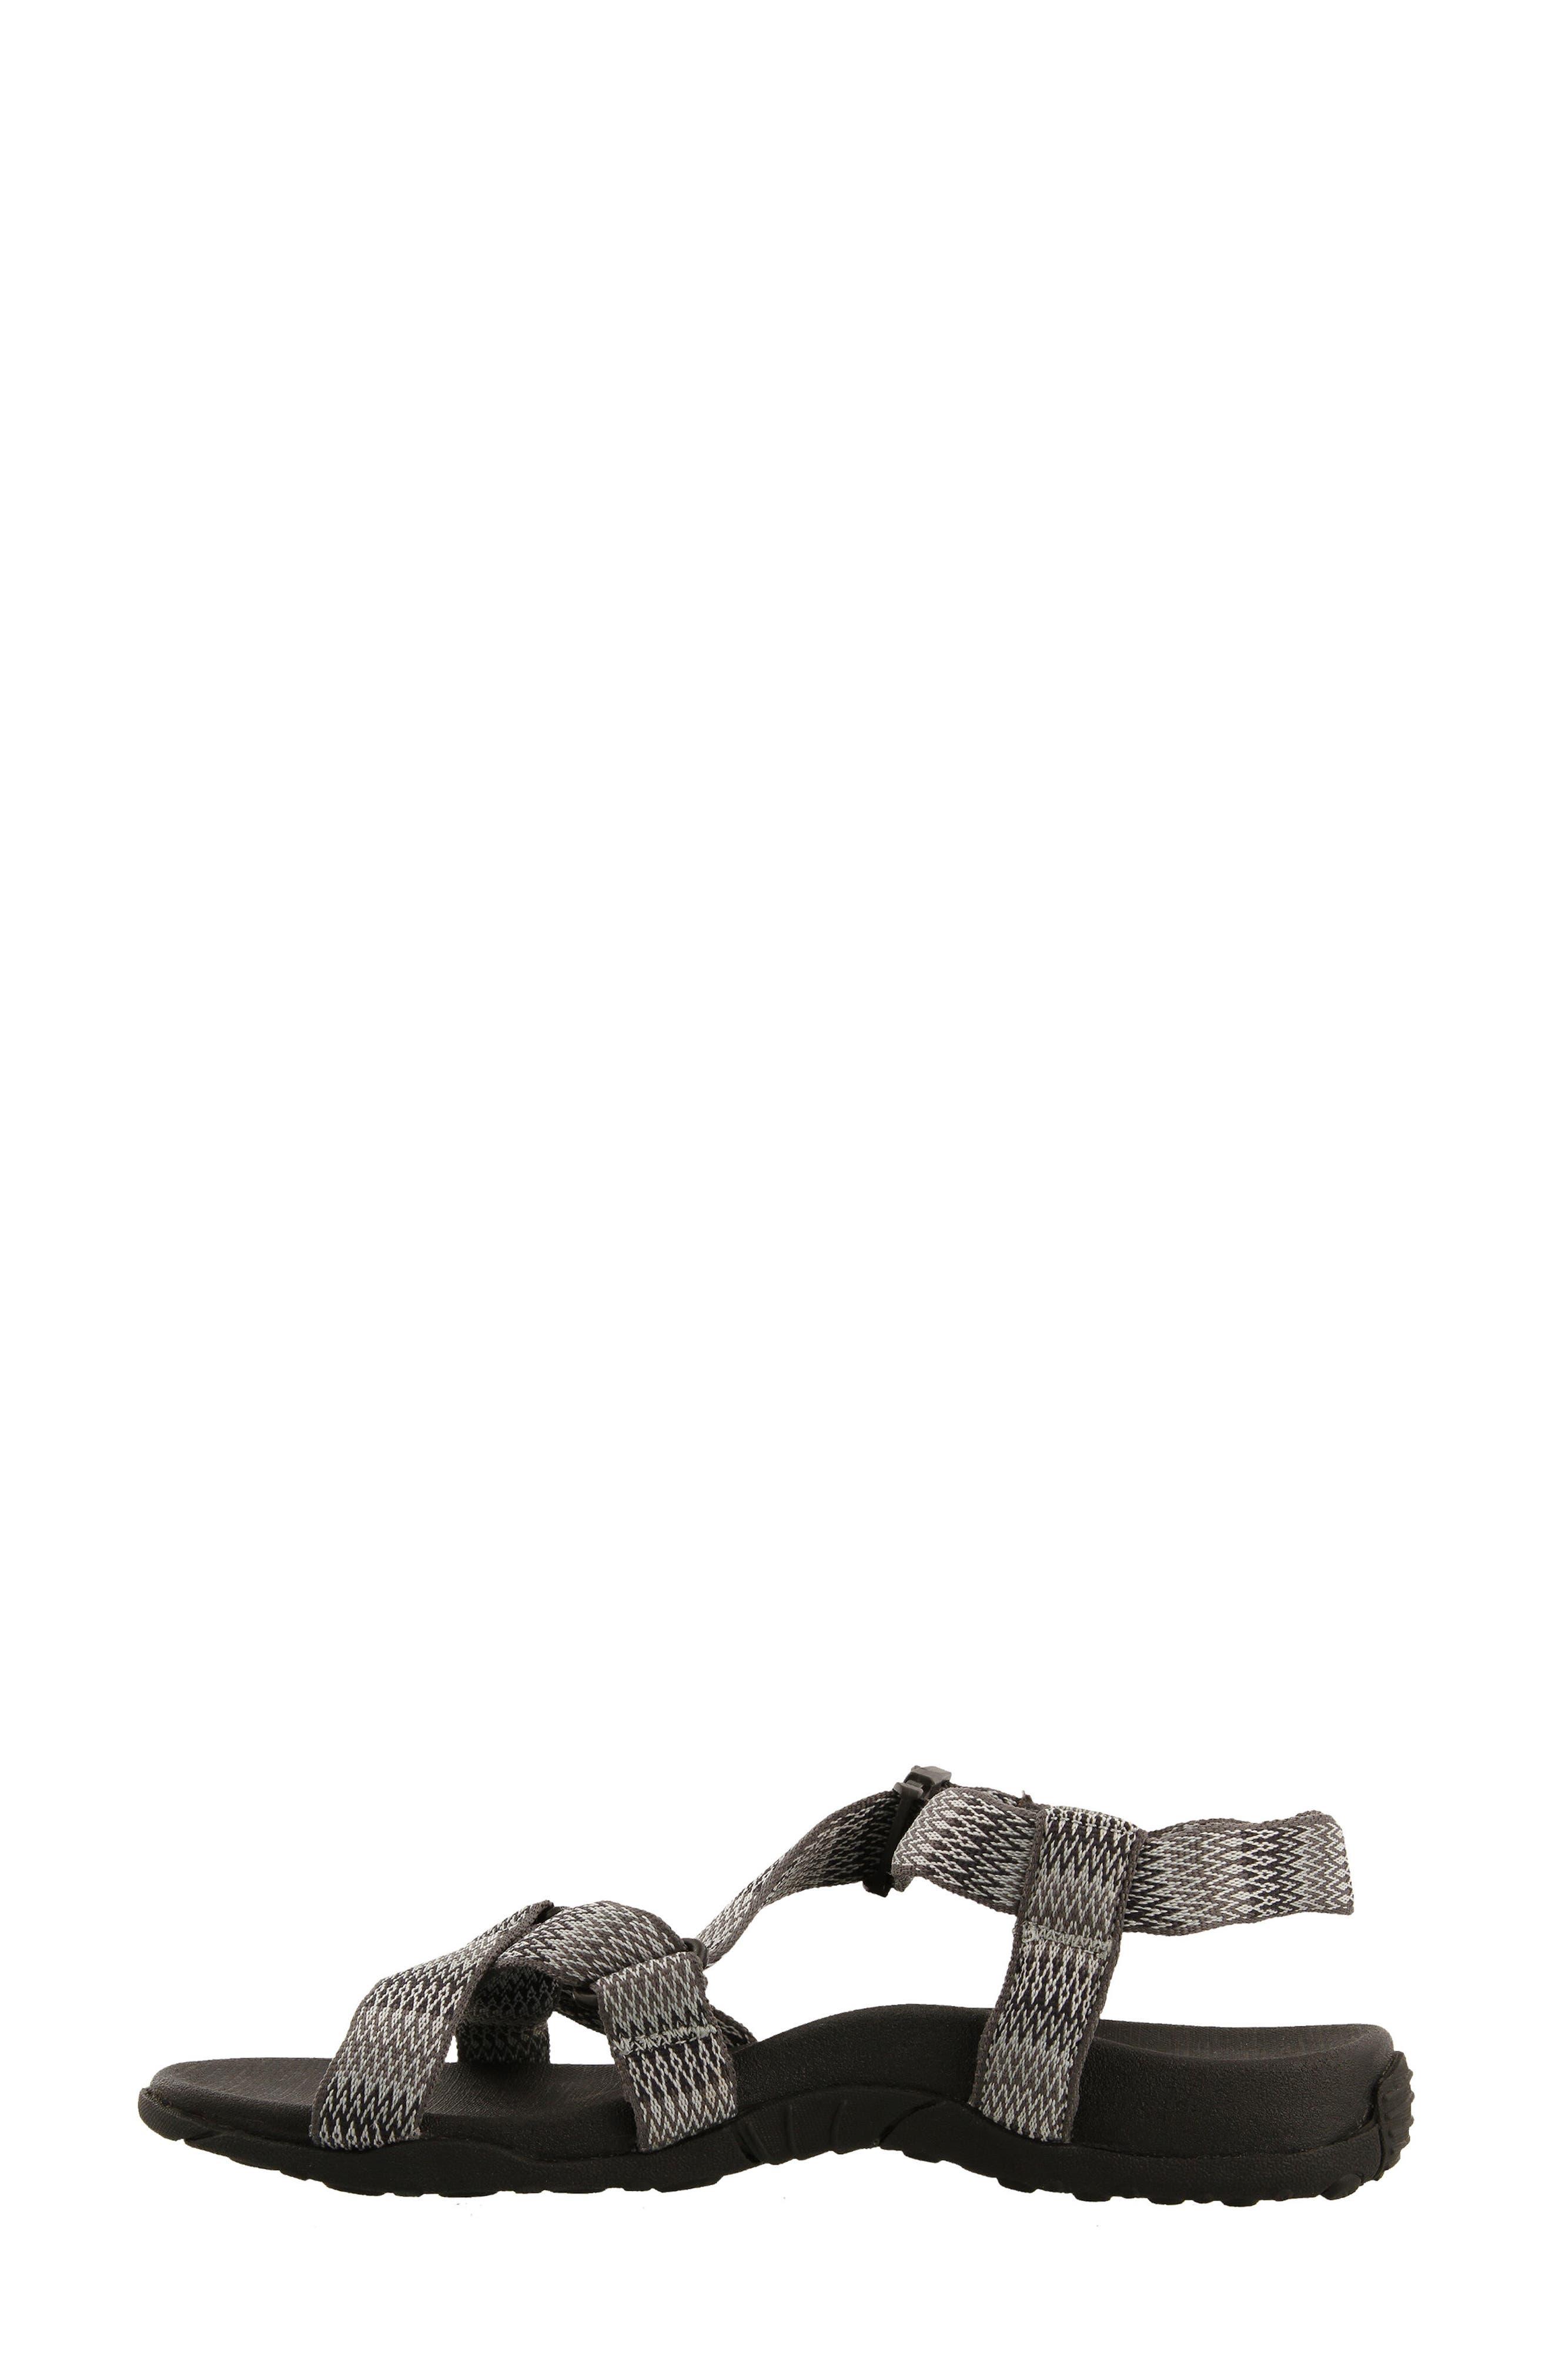 New Wave Sandal,                             Alternate thumbnail 5, color,                             BLACK FABRIC